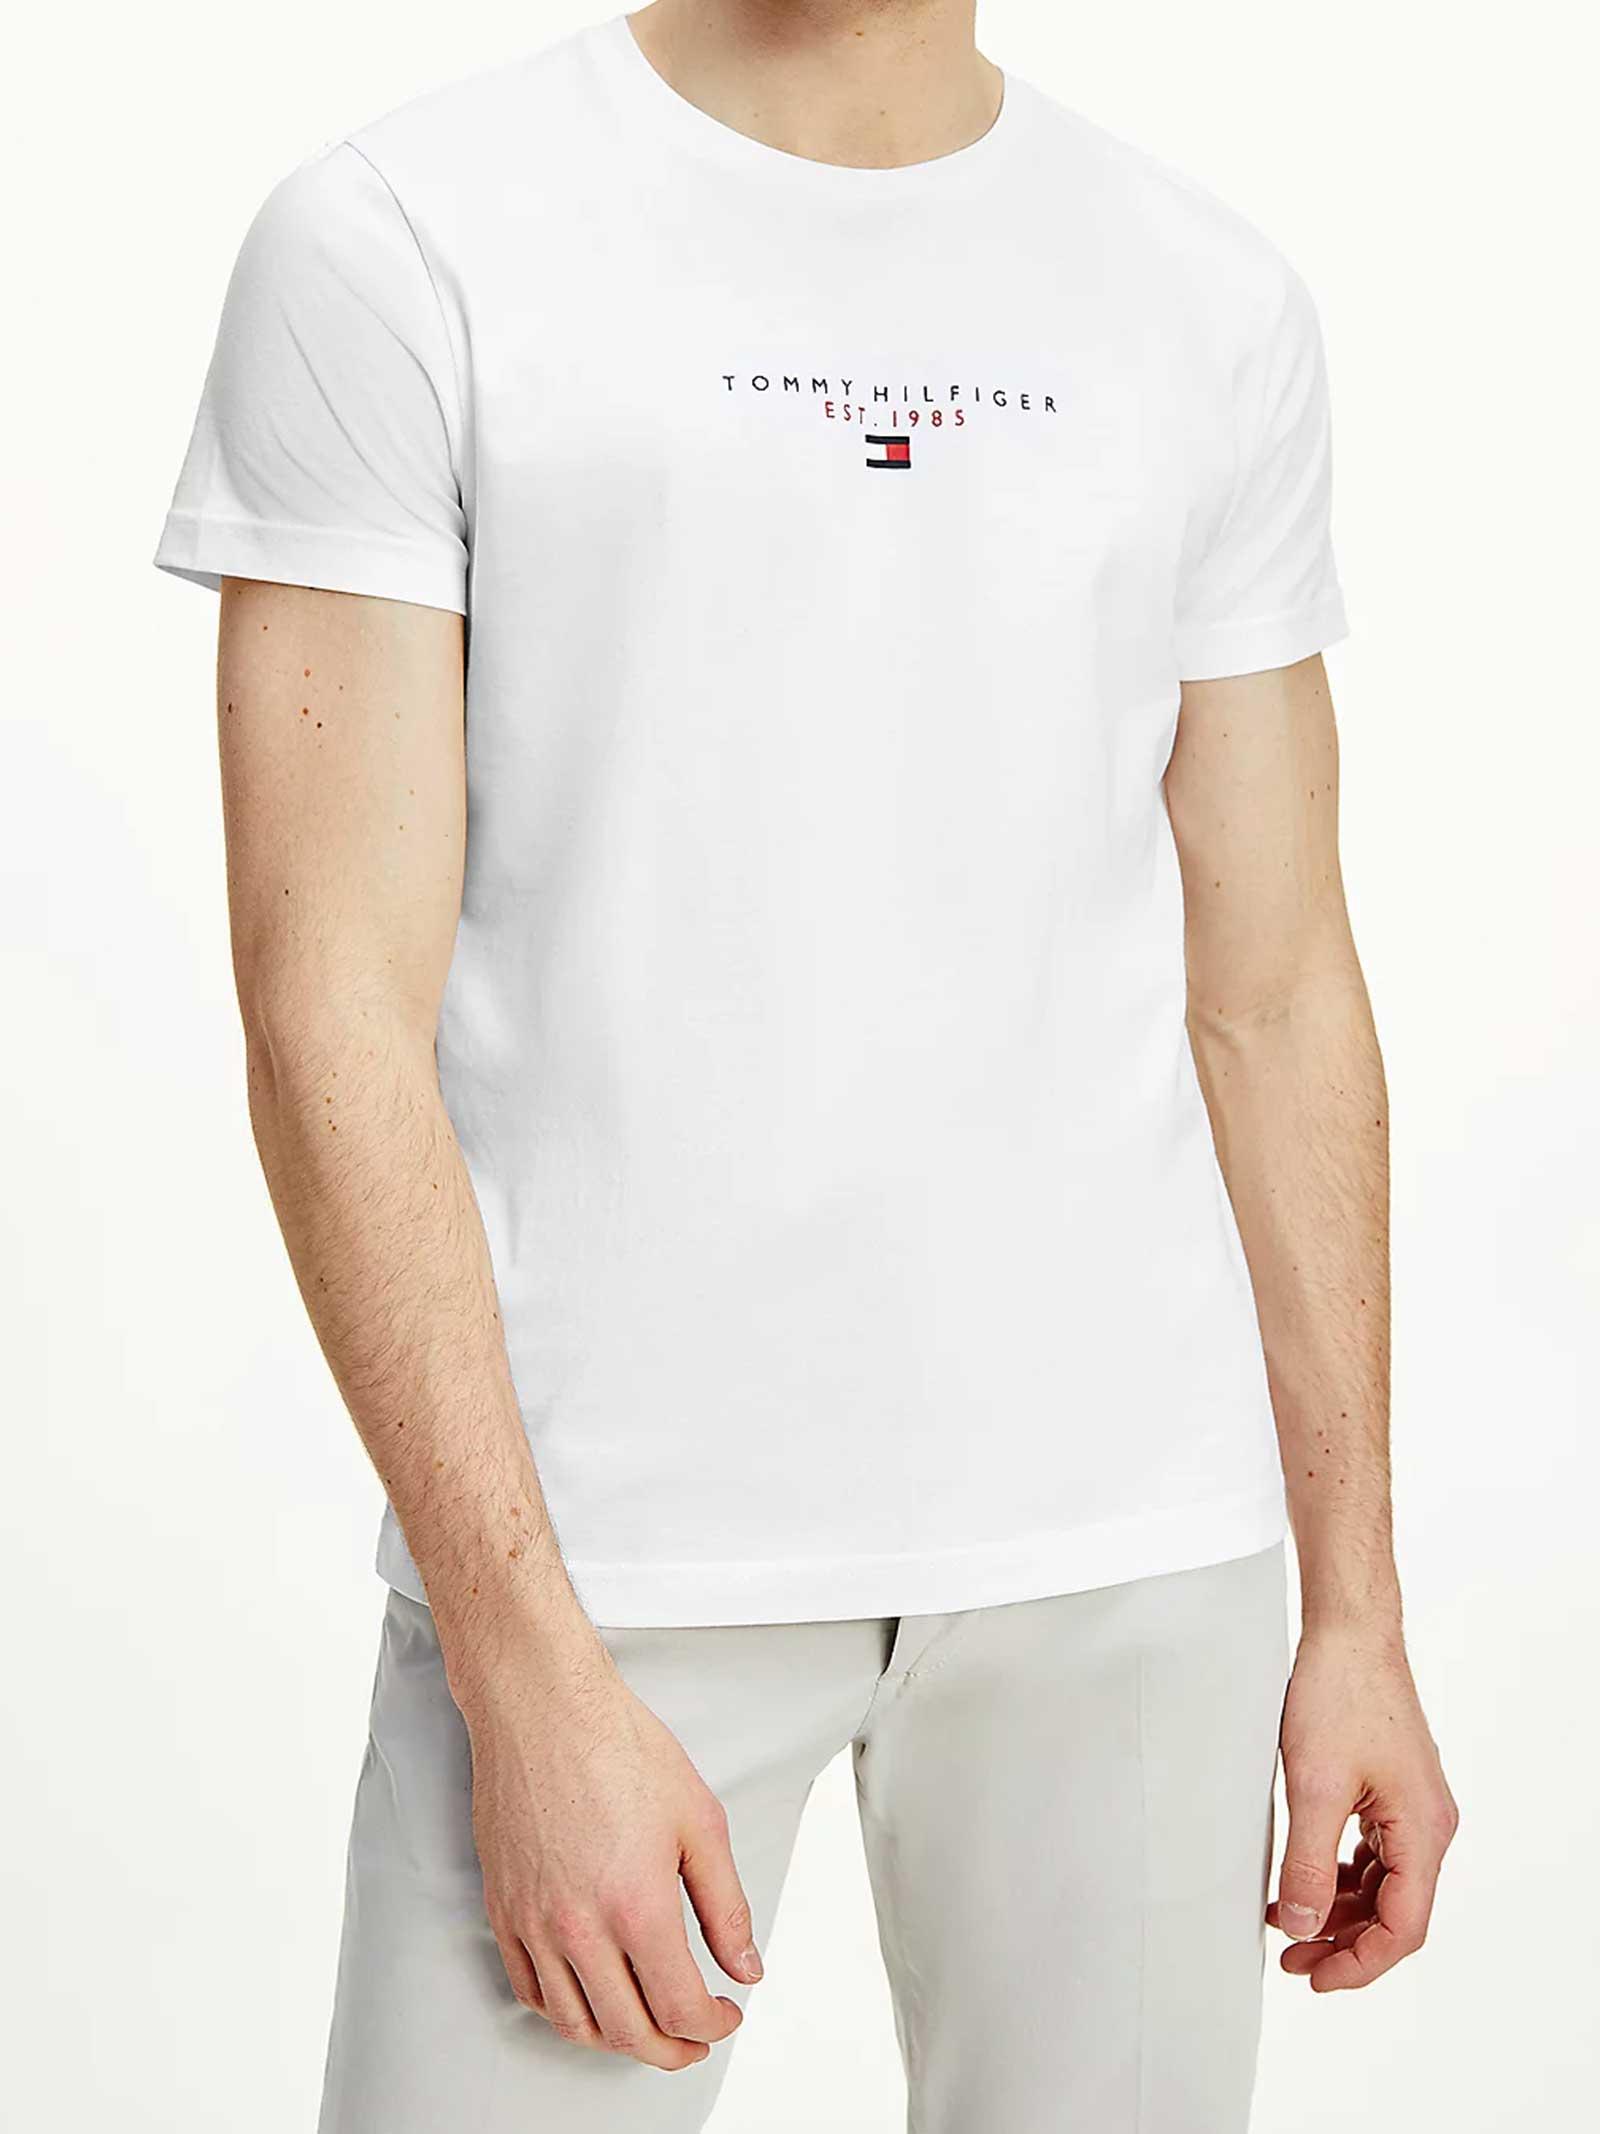 T-SHIRT UOMO TOMMY HILFIGER | T-shirt | MW0MW17676YBR